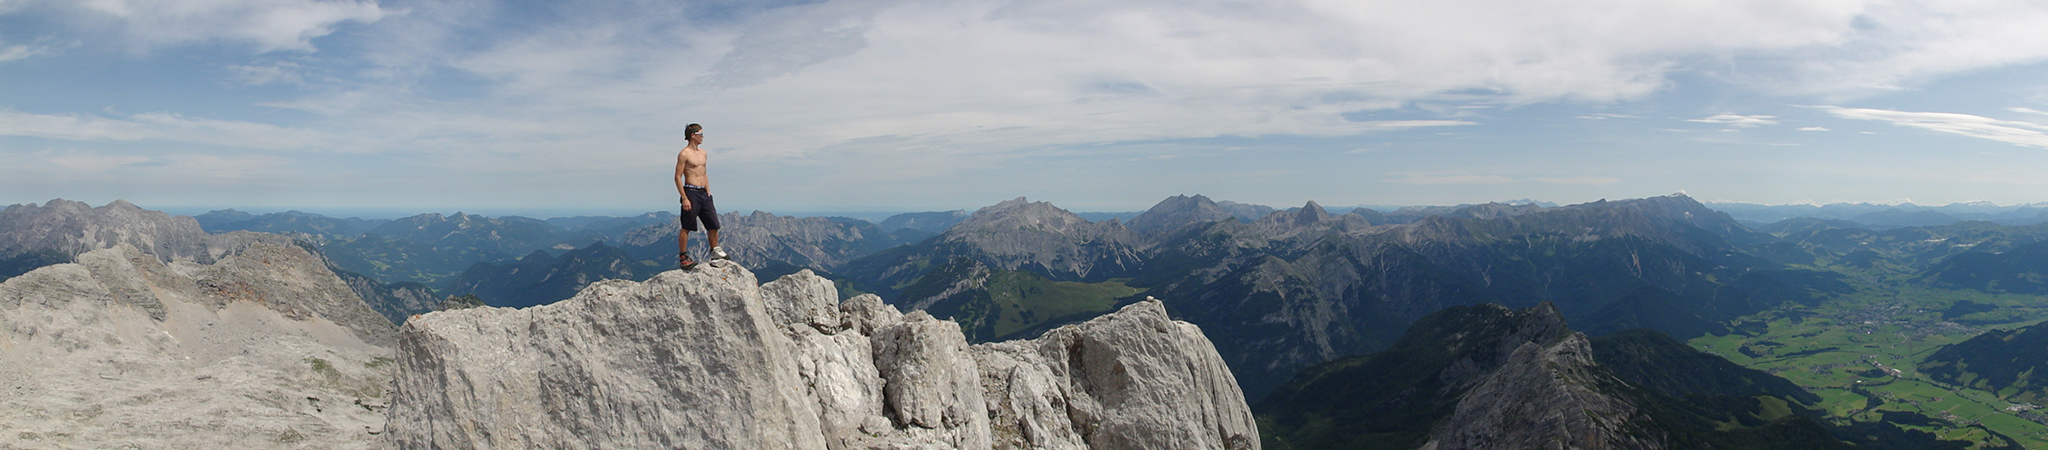 Arnoweg: Panorama am Gipfel des Birnhorns (2634 m)